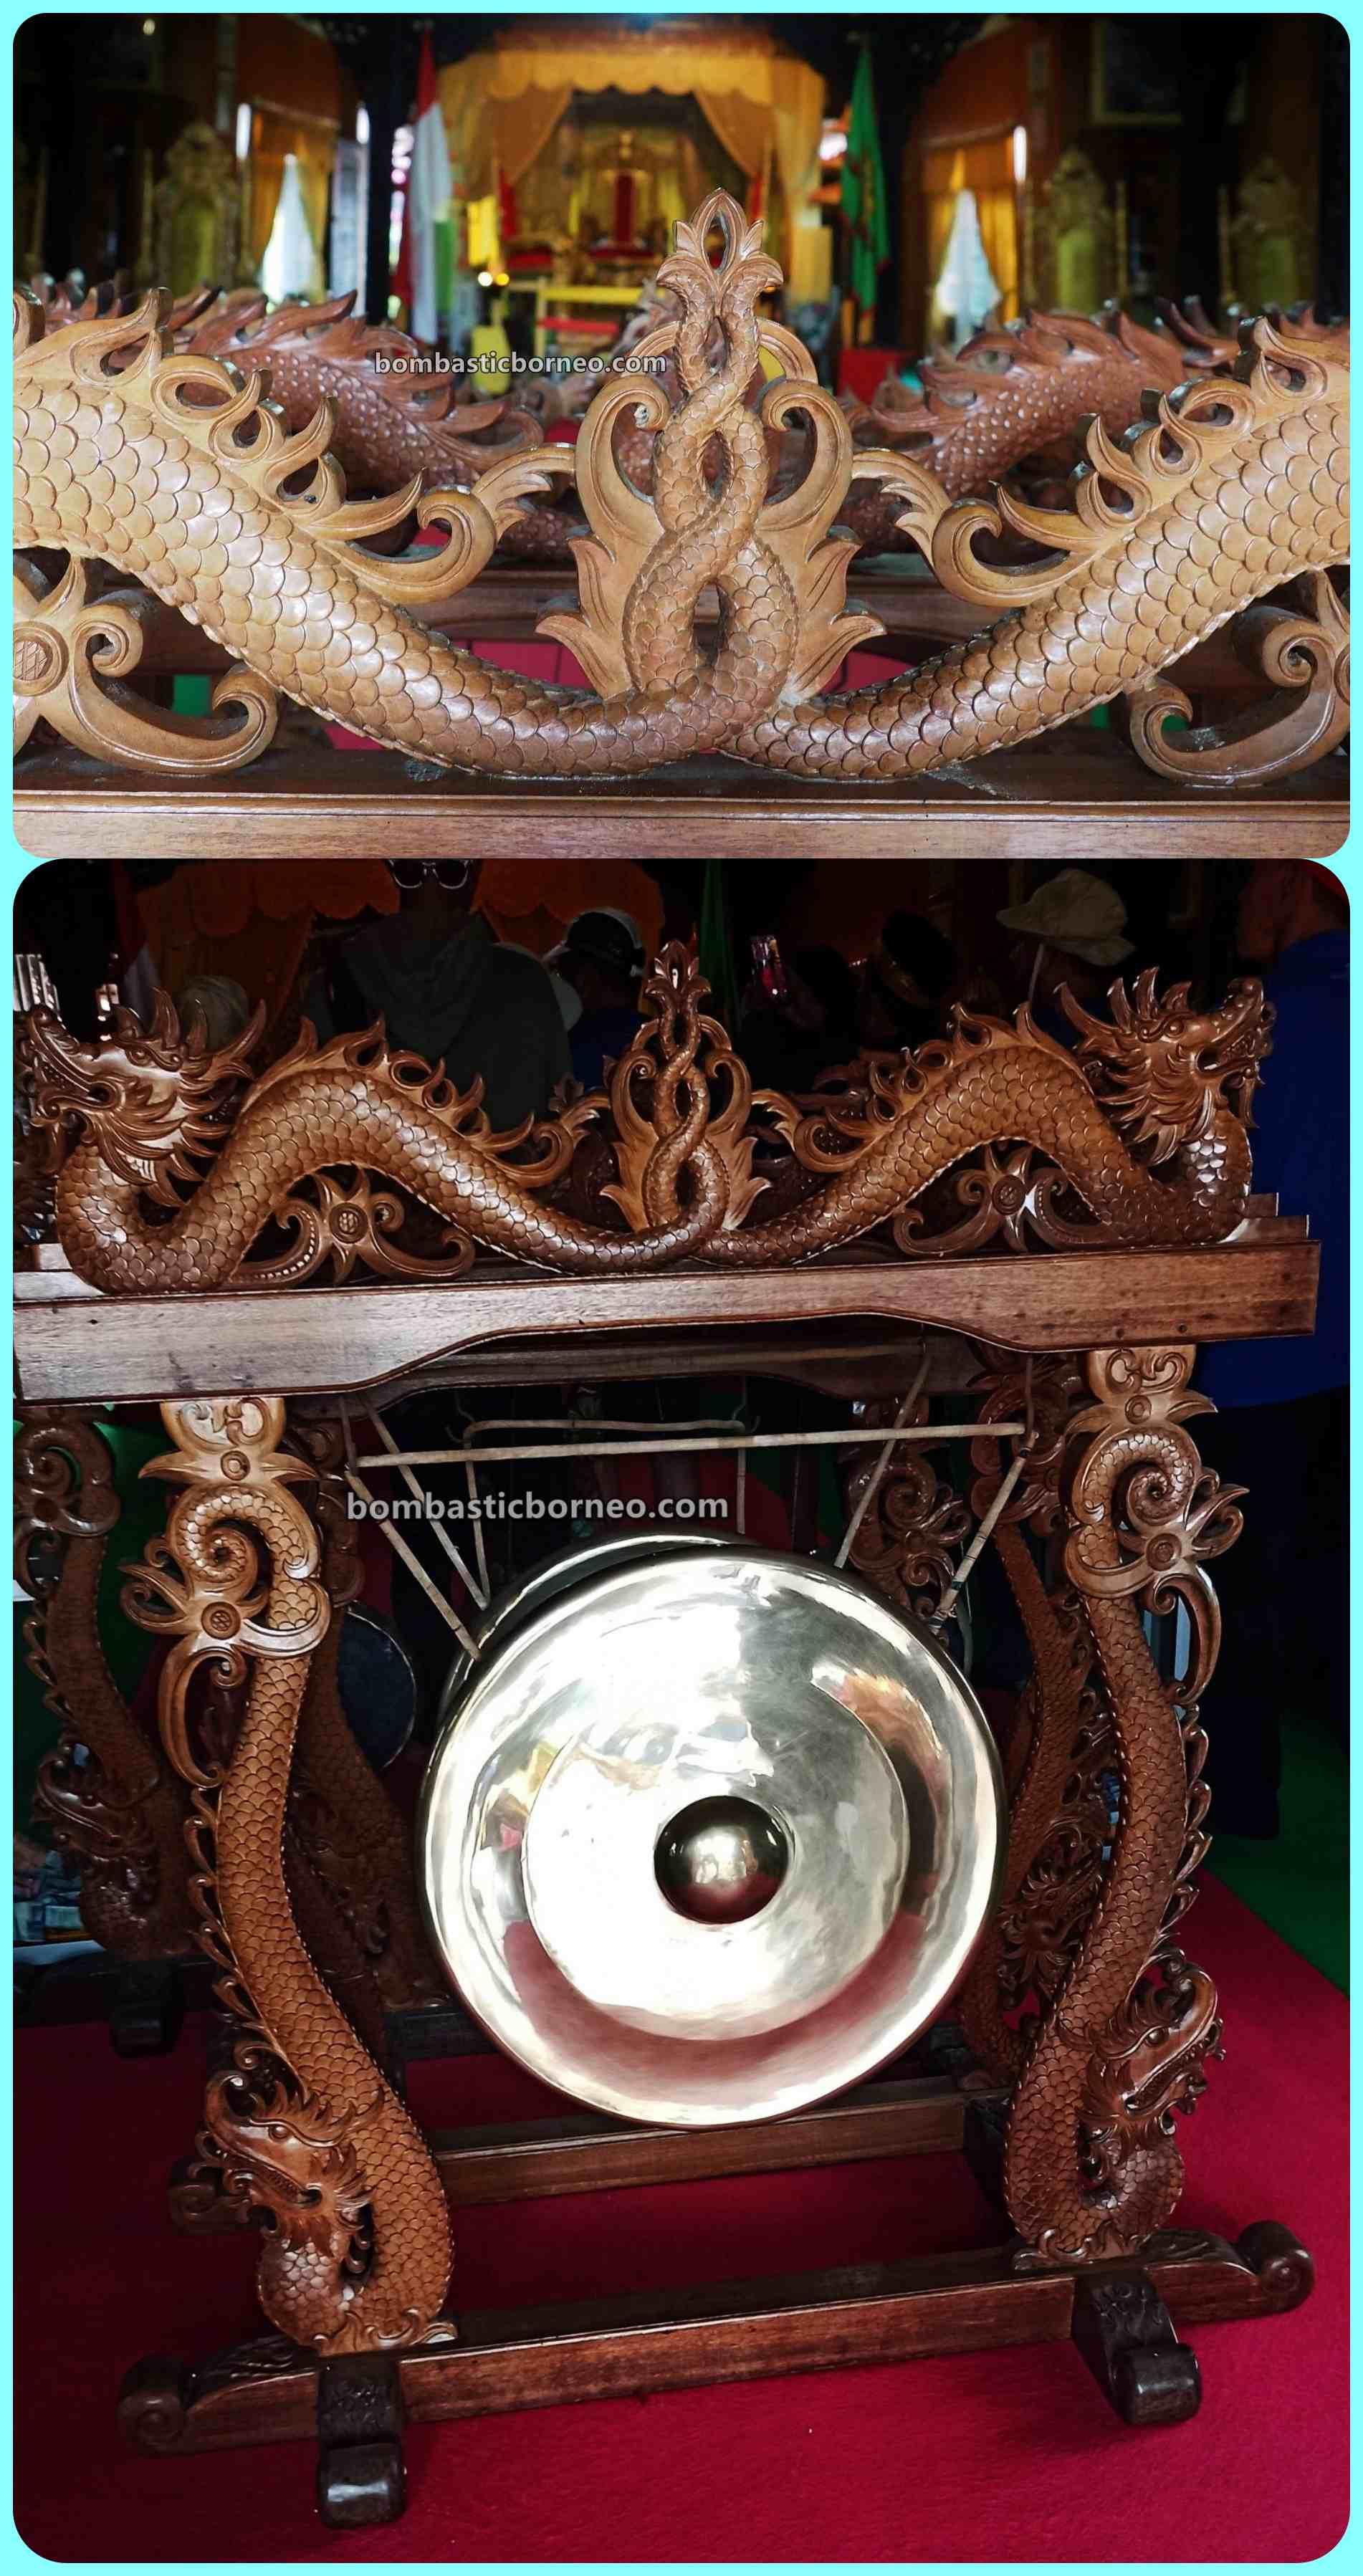 Rumah Adat, Heritage Centre, culture, museum, authentic, traditional, native, tribe, Kalimantan Utara, Tourist attraction, travel guide, Borneo, 跨境婆罗洲游踪, 印尼北加里曼丹, 打拉根土著文化